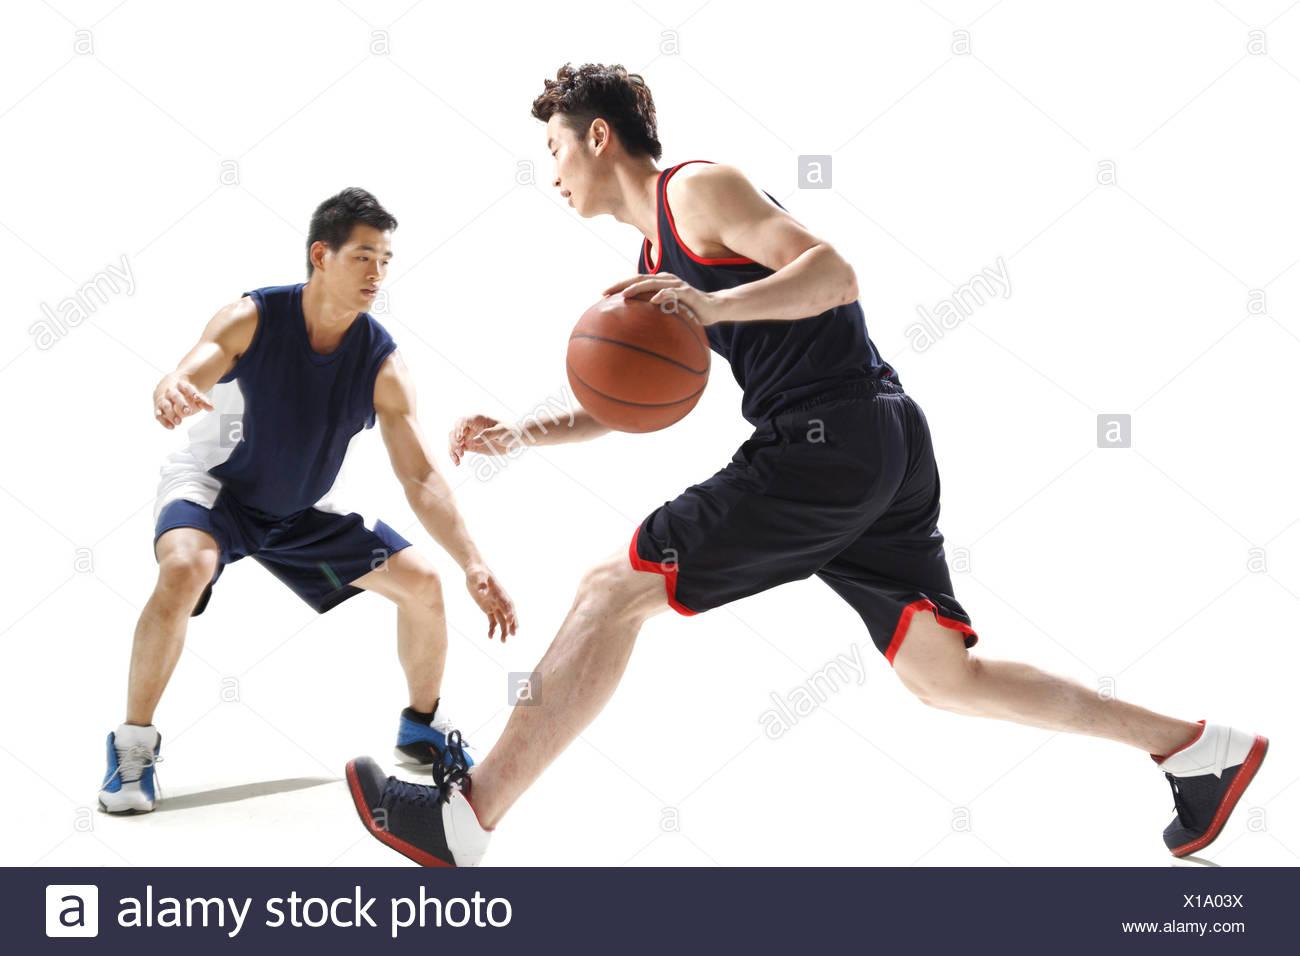 A Woman Playing Basketball Imágenes De Stock A Woman: Passing Basketball Stock Photos & Passing Basketball Stock